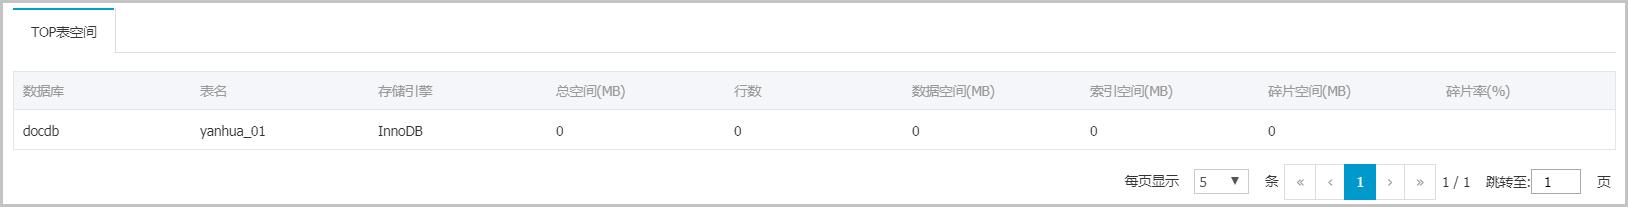 TOP表所占空间详情